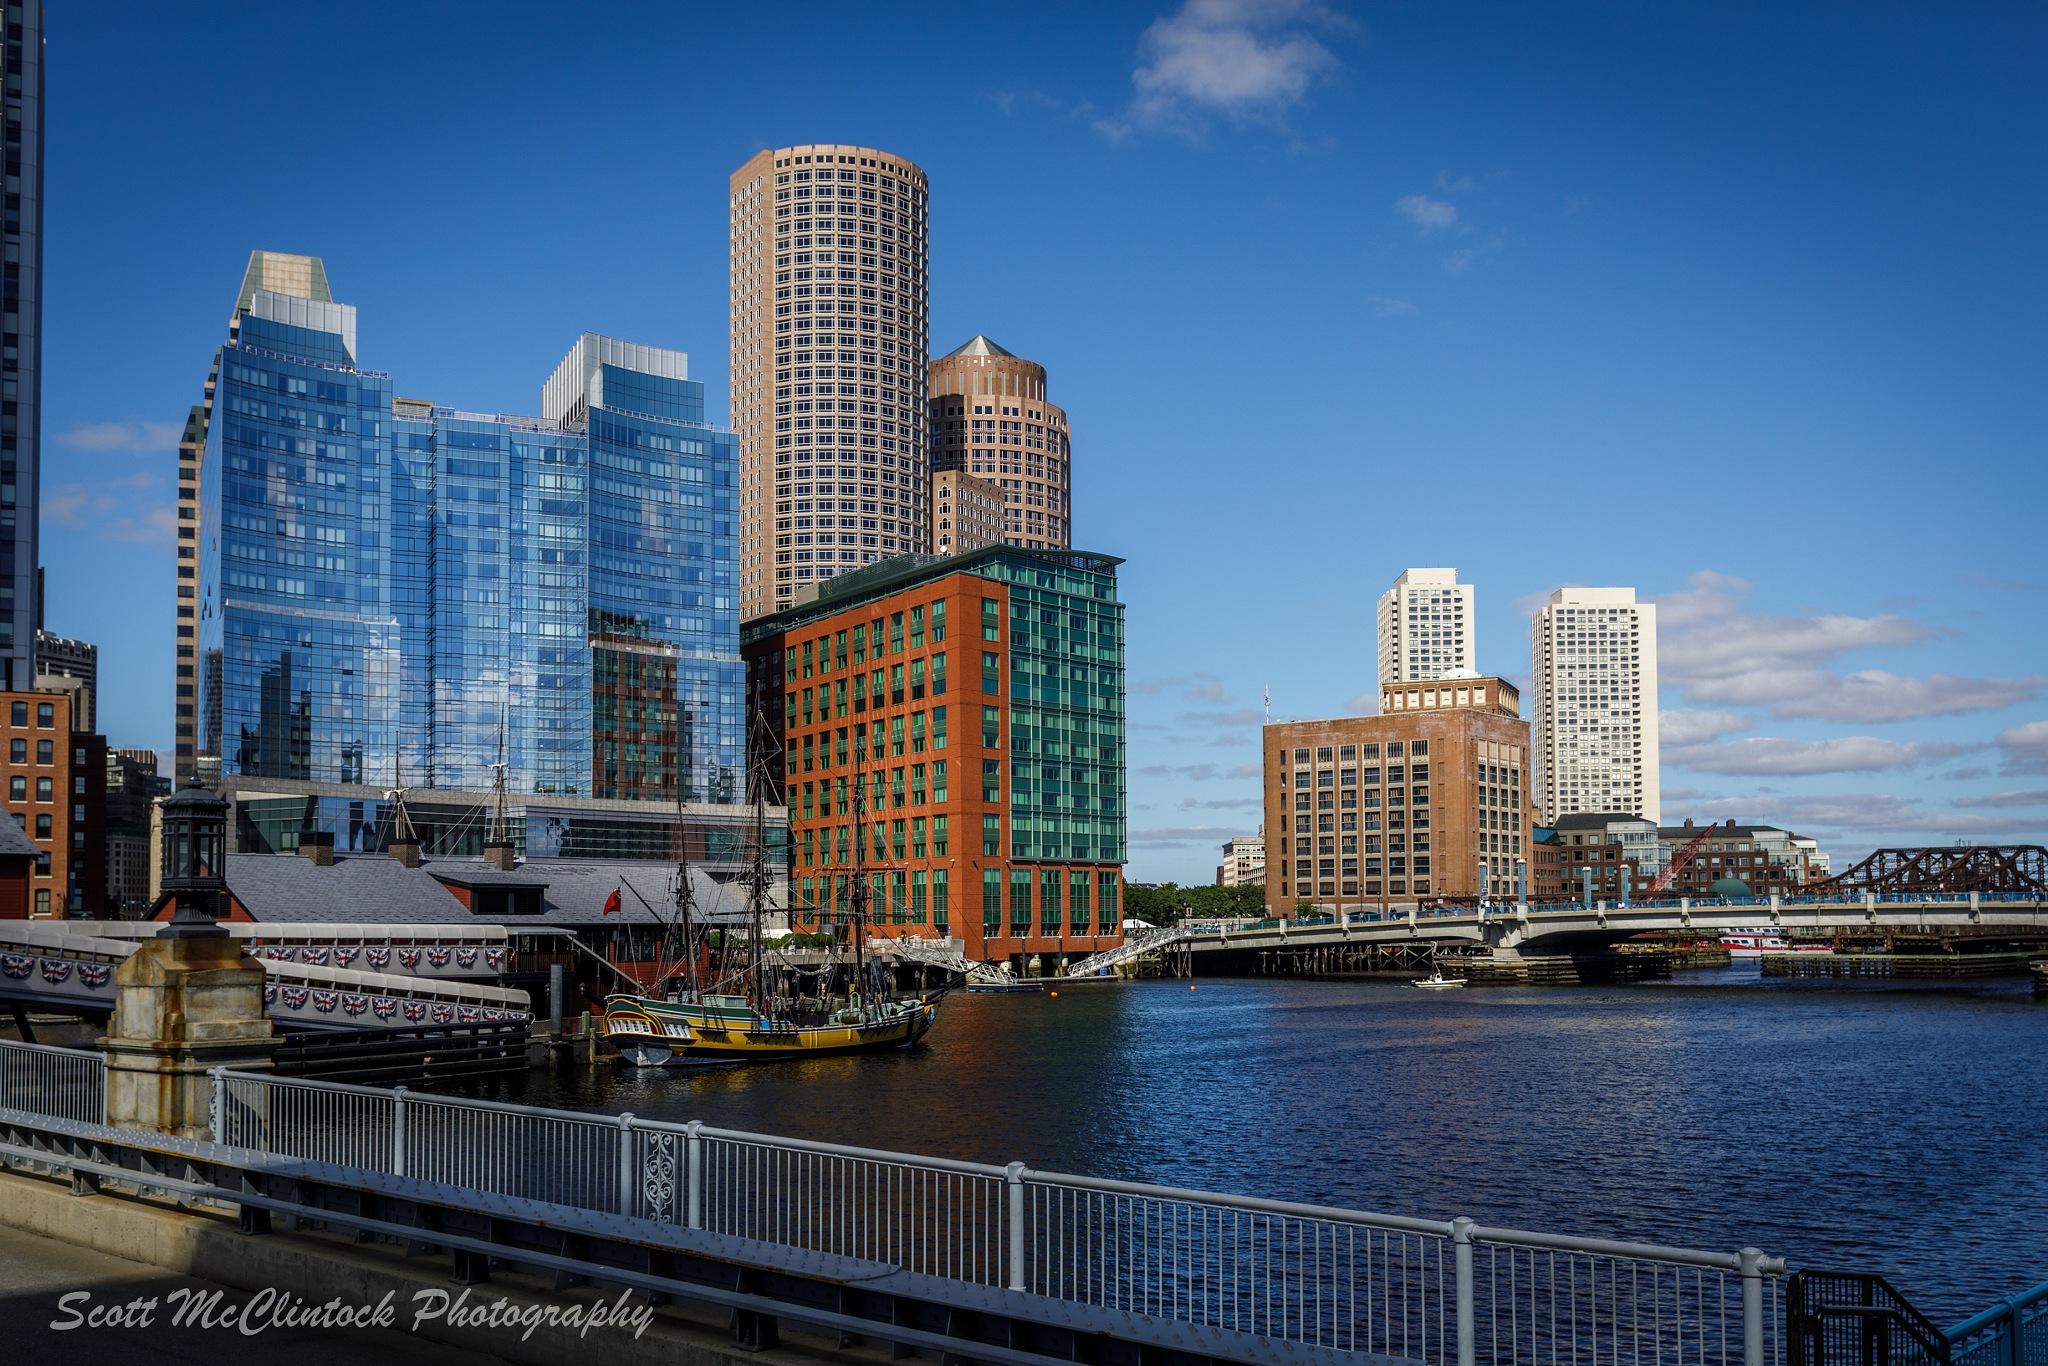 Boston Tea Party - Day View by Scottmcc